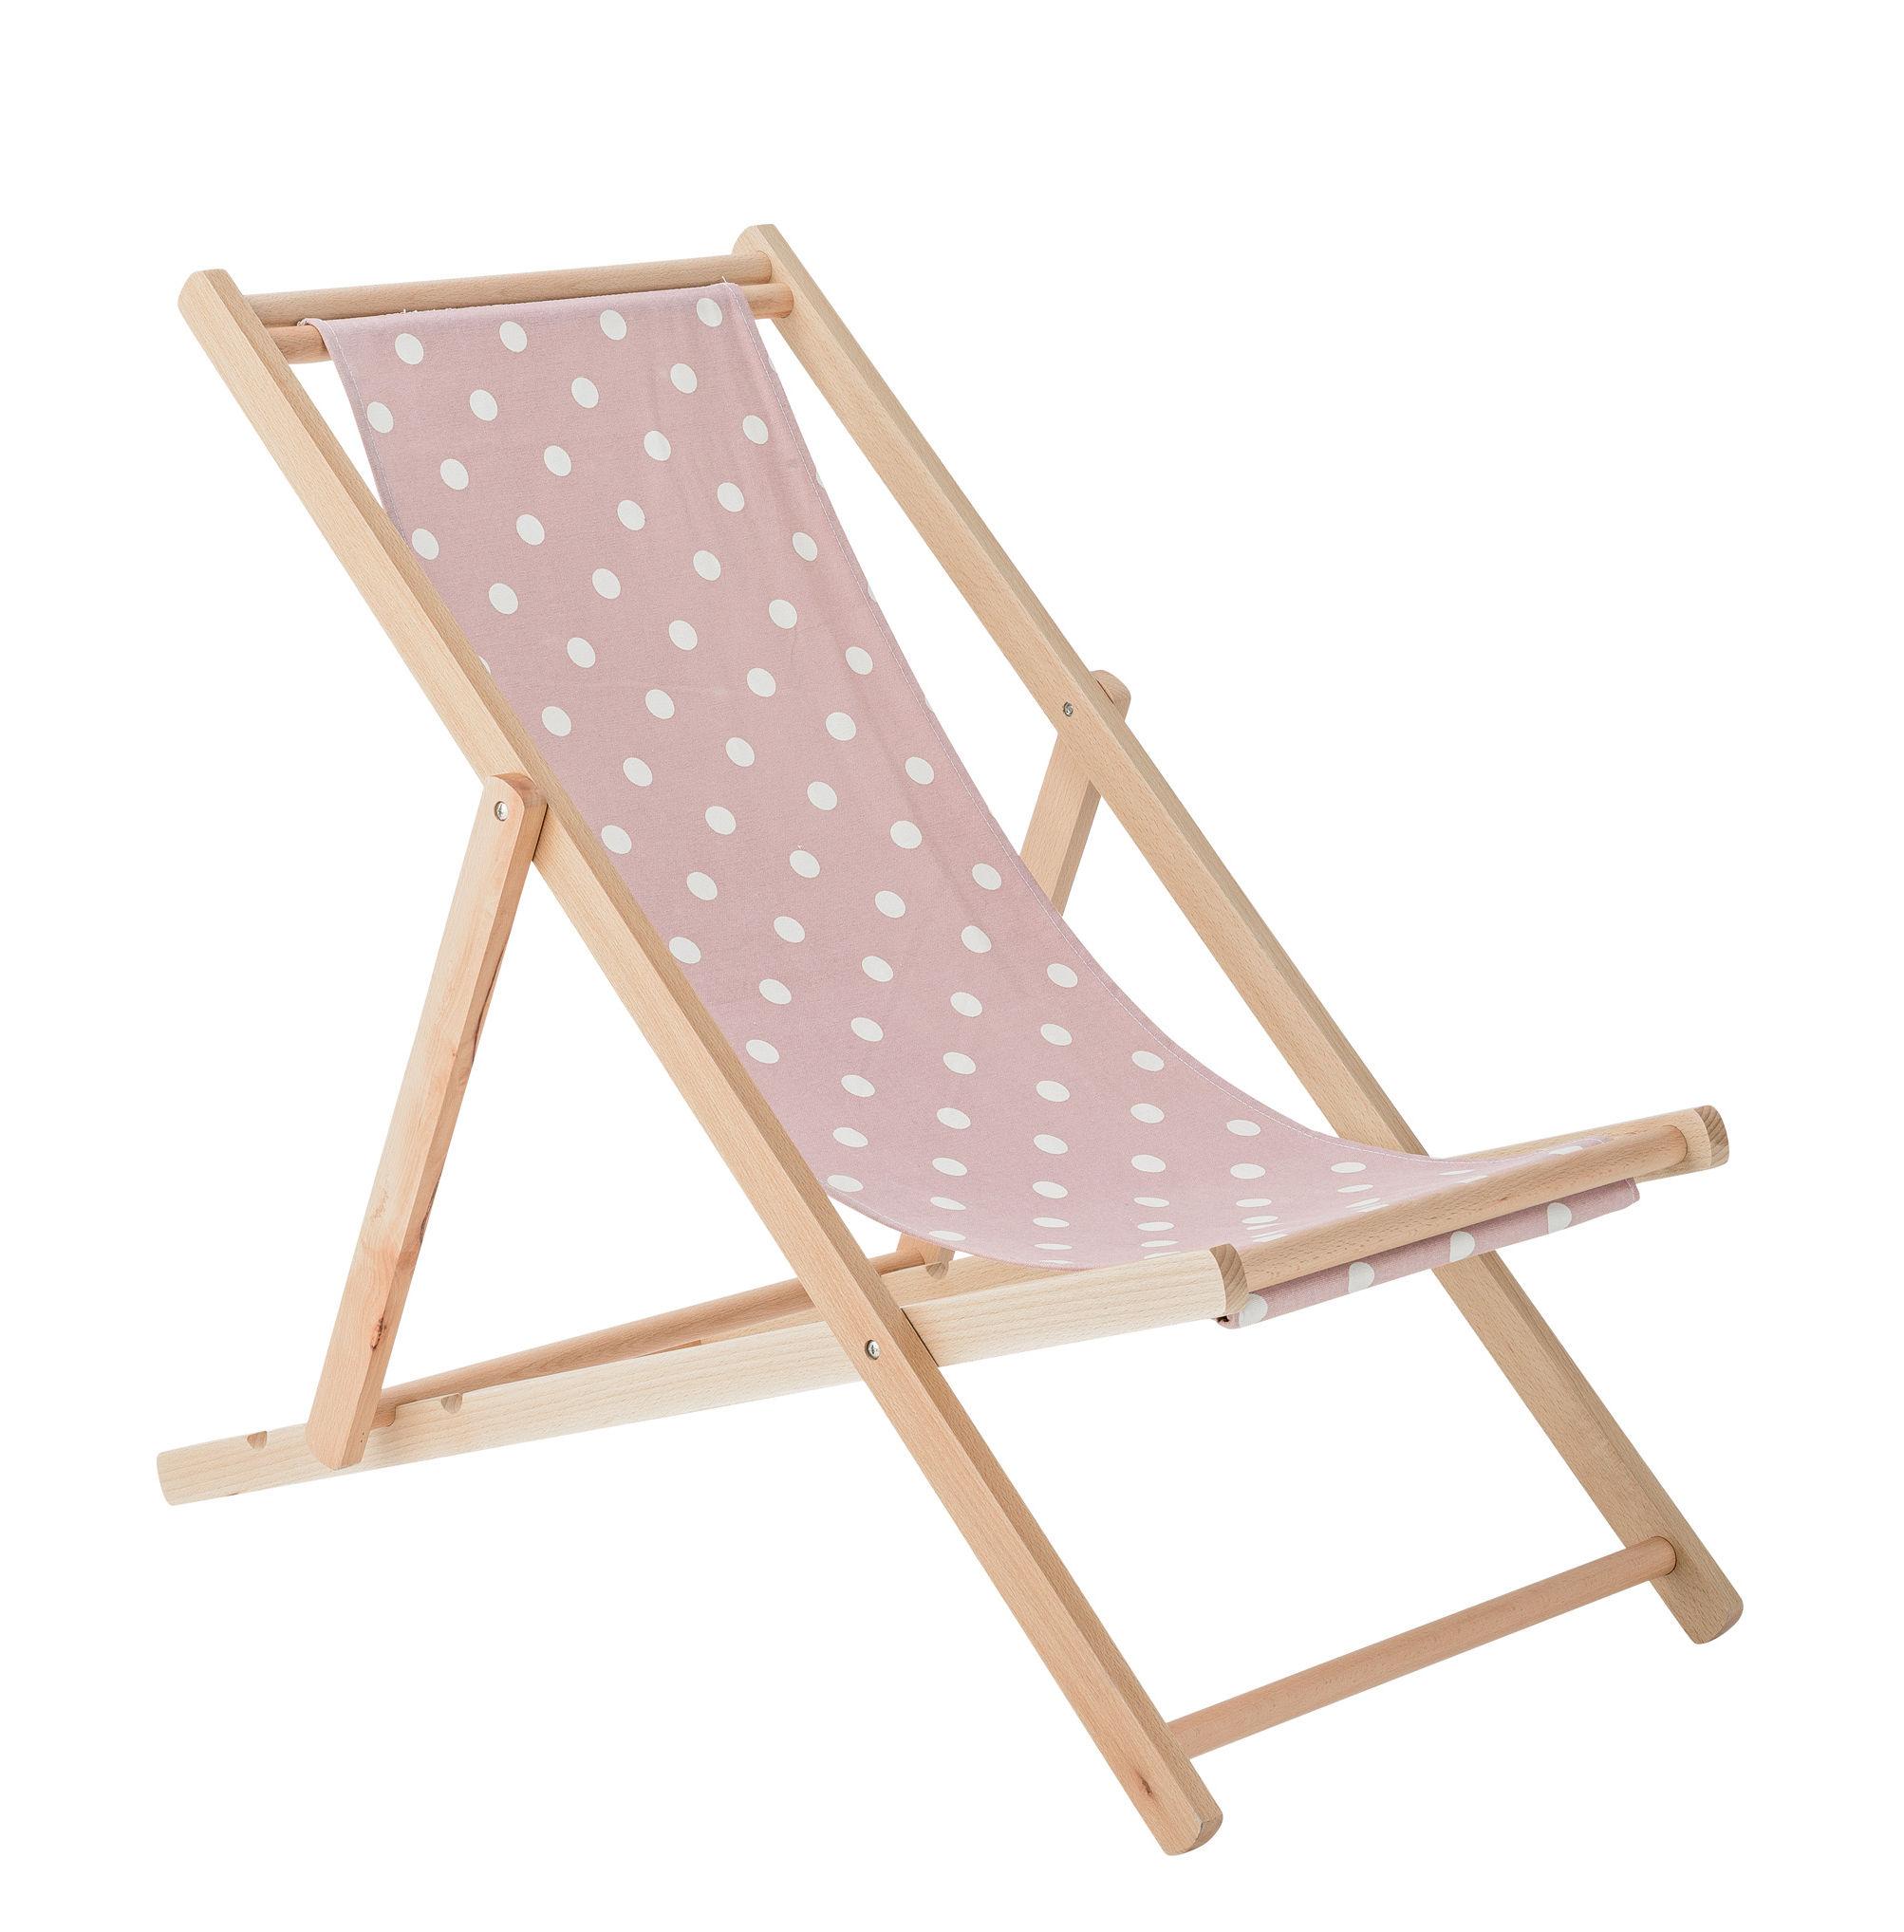 Chaise longue di Bloomingville - Bianco/Legno naturale | Made In Design